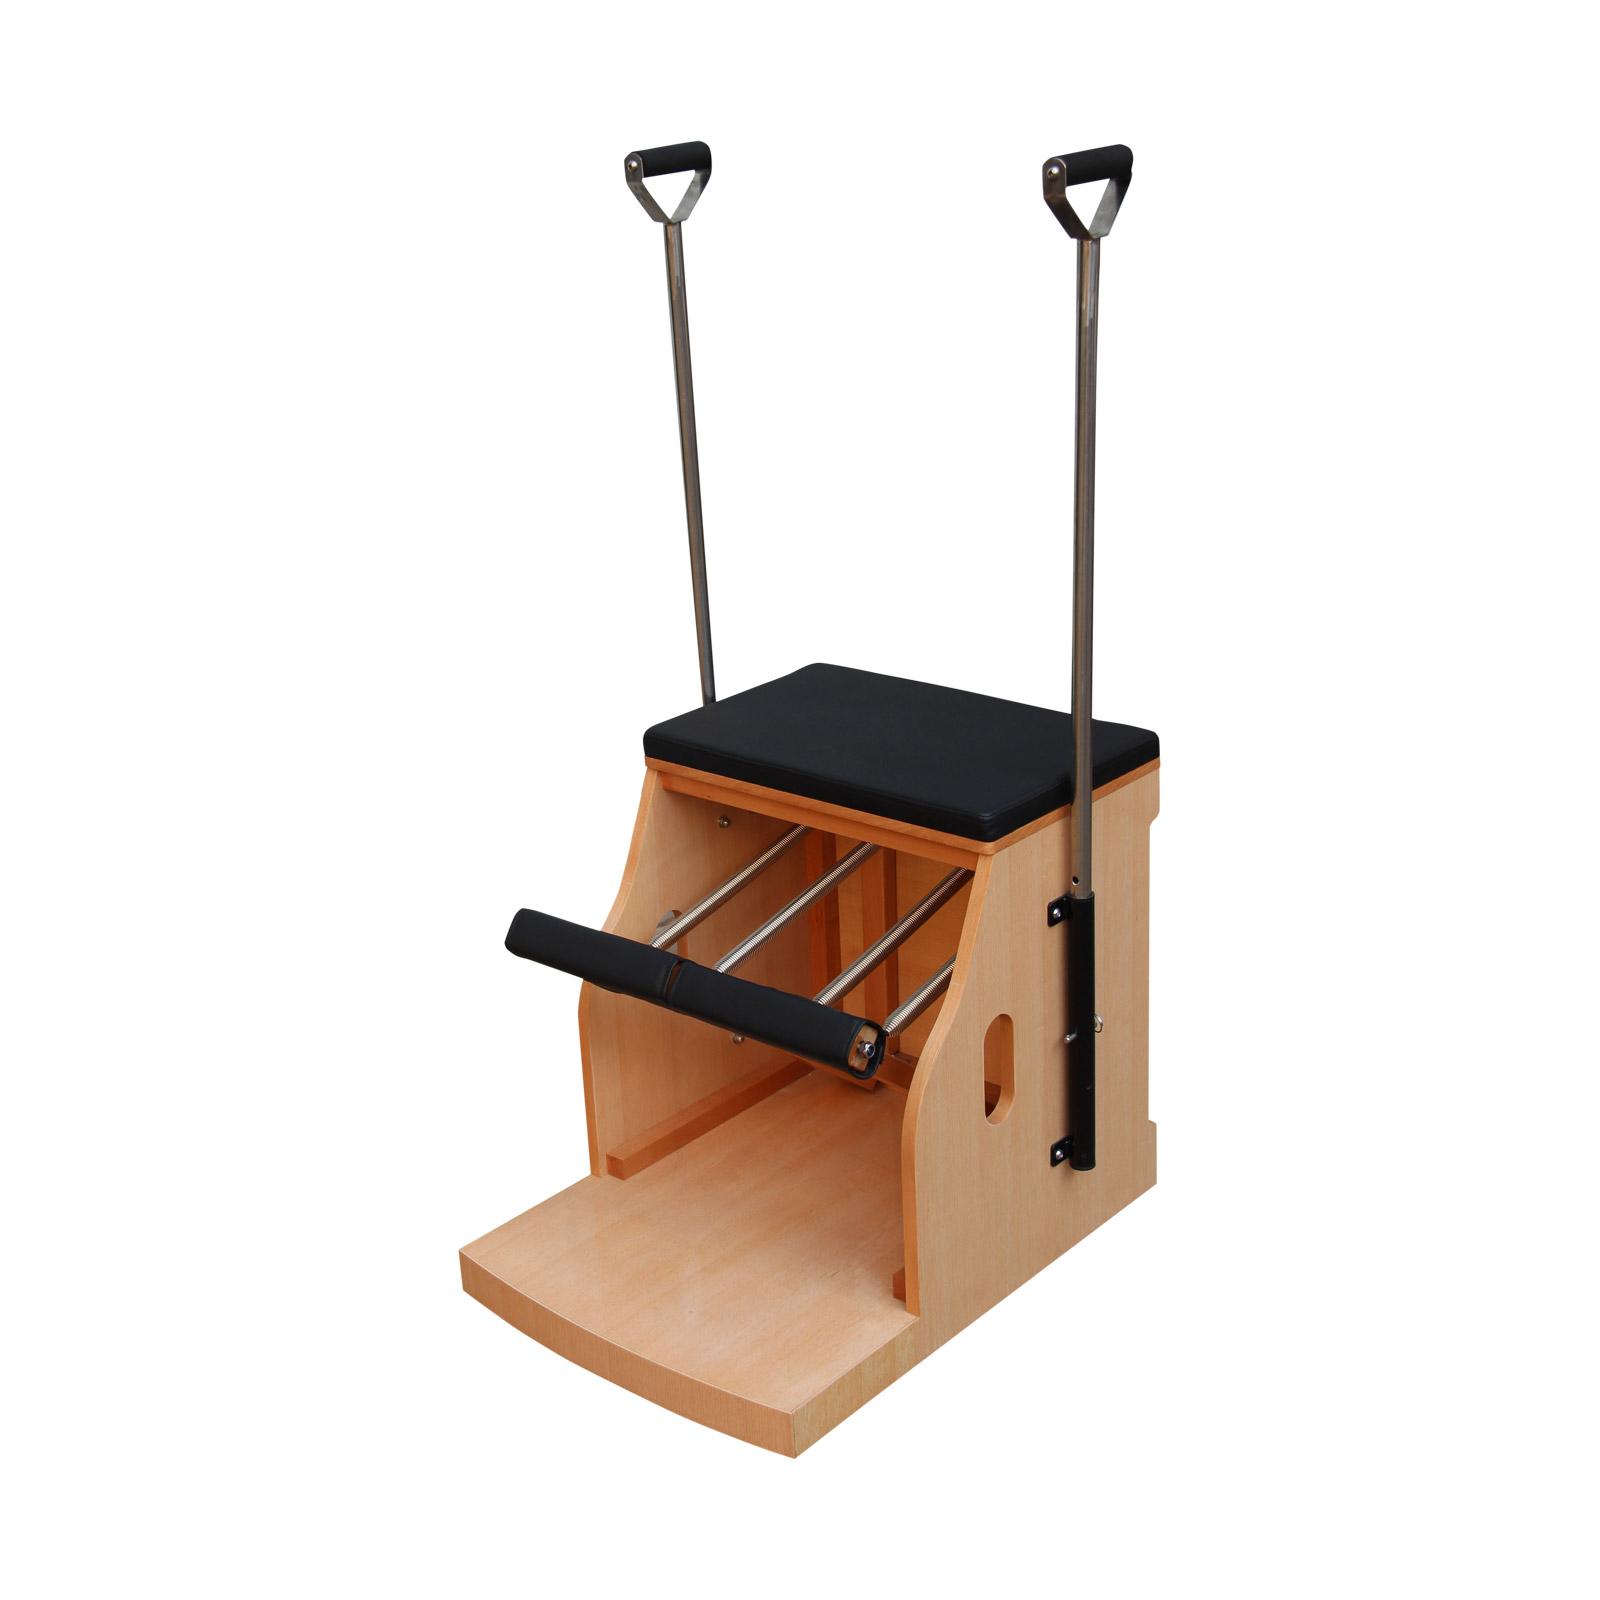 Refurbished: Pilates Wunda Chair with Handles - 2018 Model